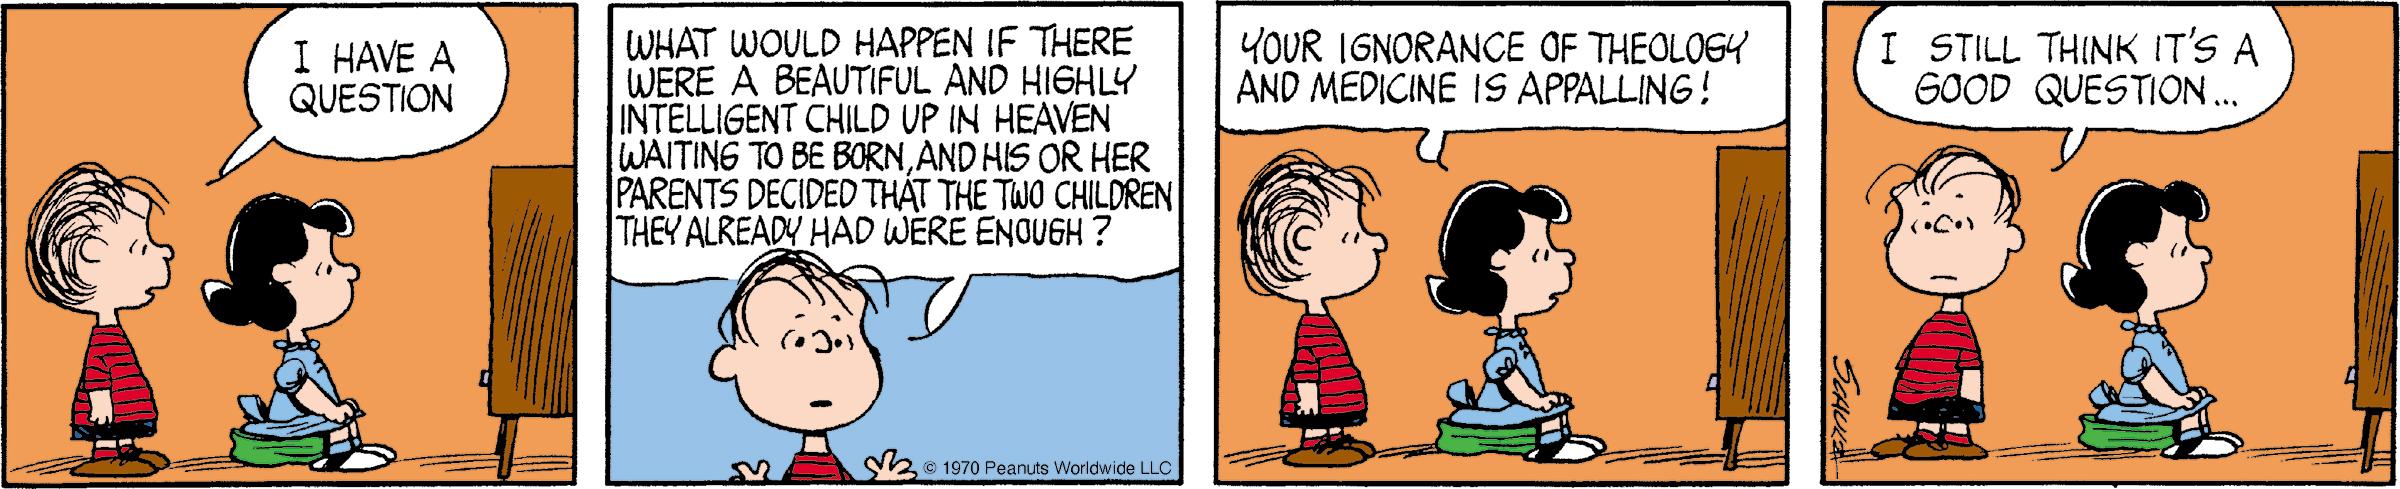 A Peanuts comic strip from July 20, 1970